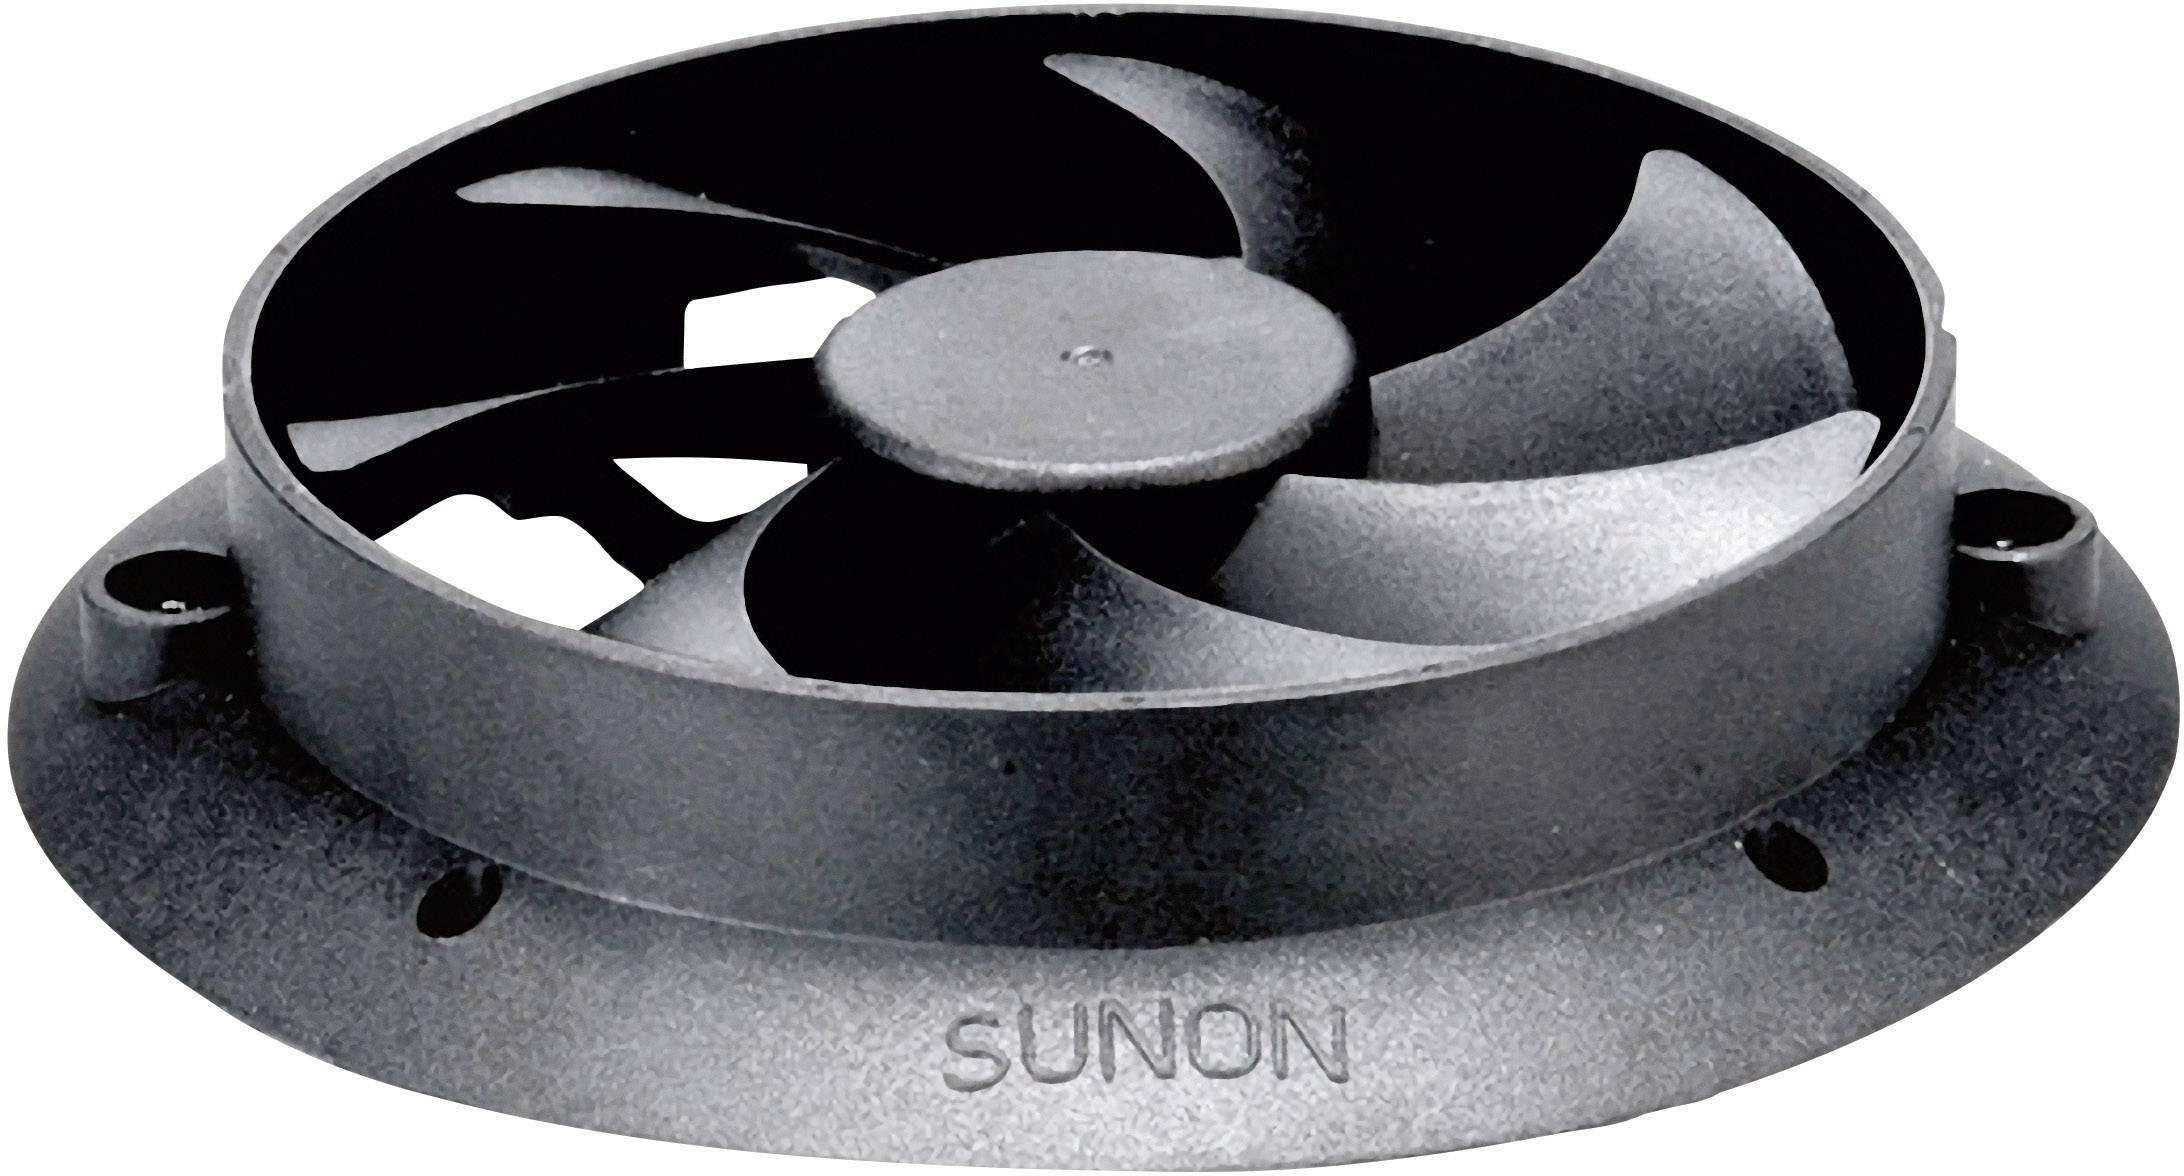 LED ventilátor Sunon, 84.9 mm x 15.4 mm, 12 V/DC